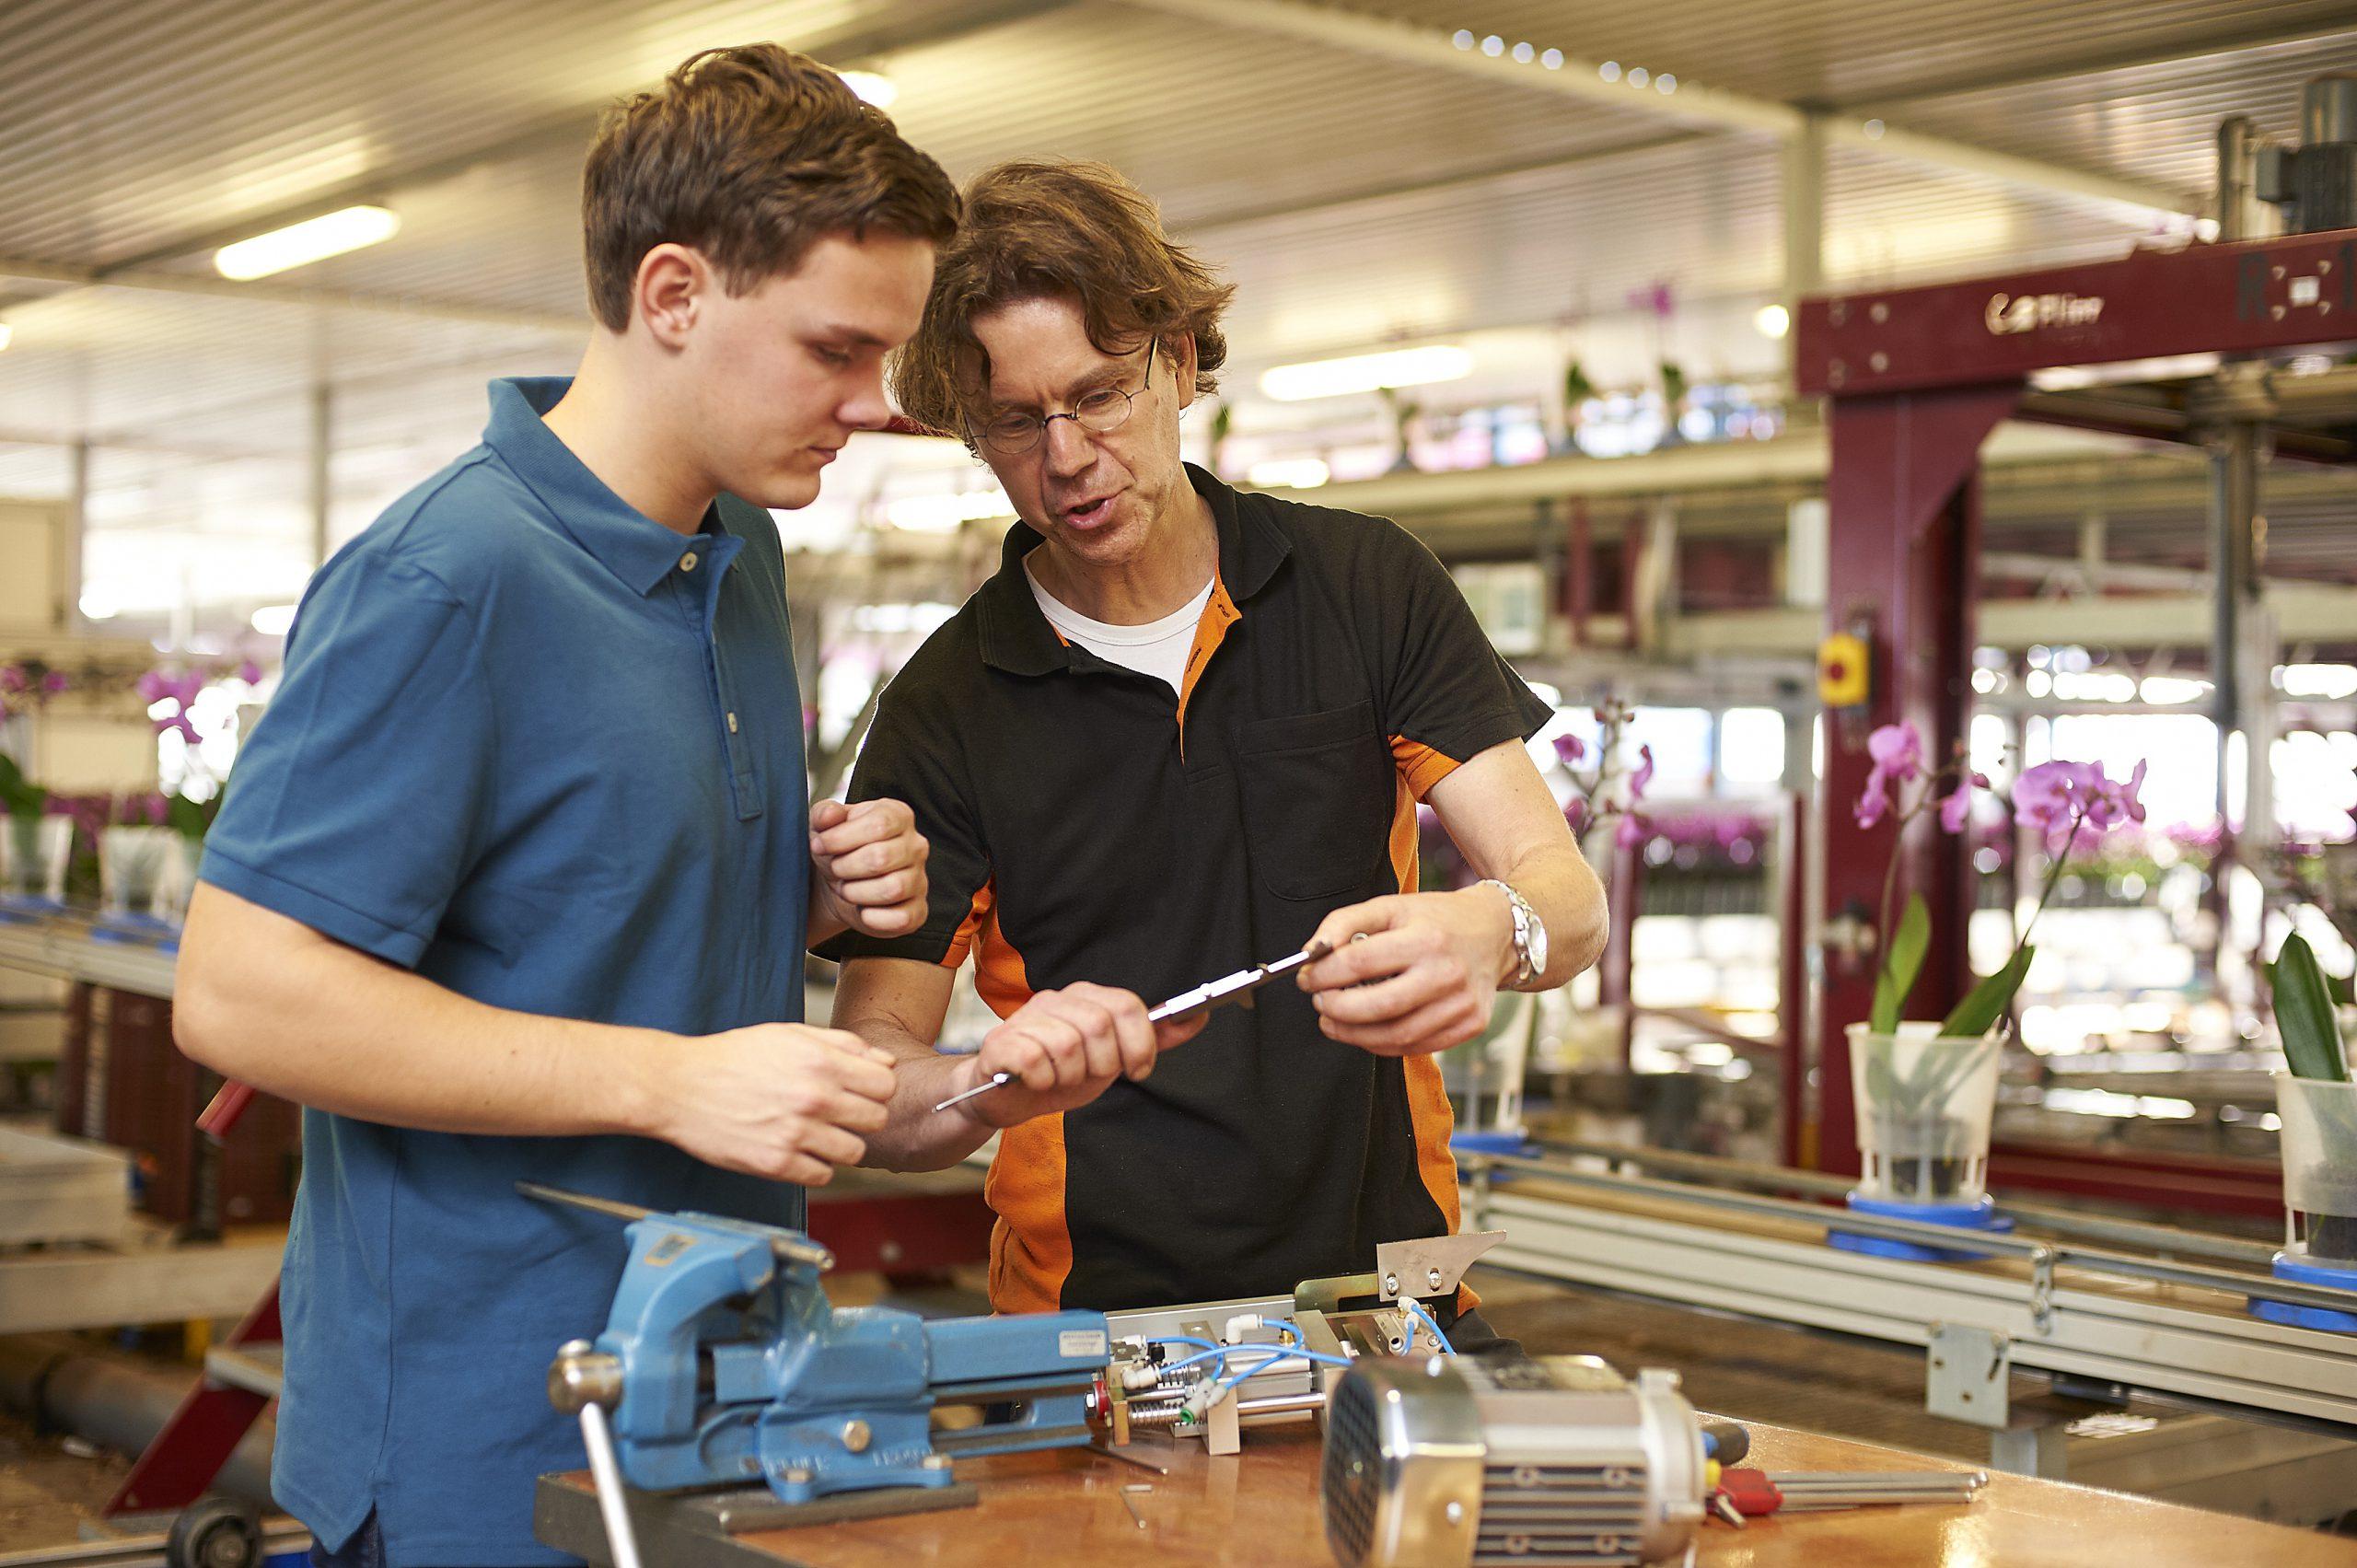 Hoe vind en behoud je talentvolle werknemers in de techniek voor je onderneming?